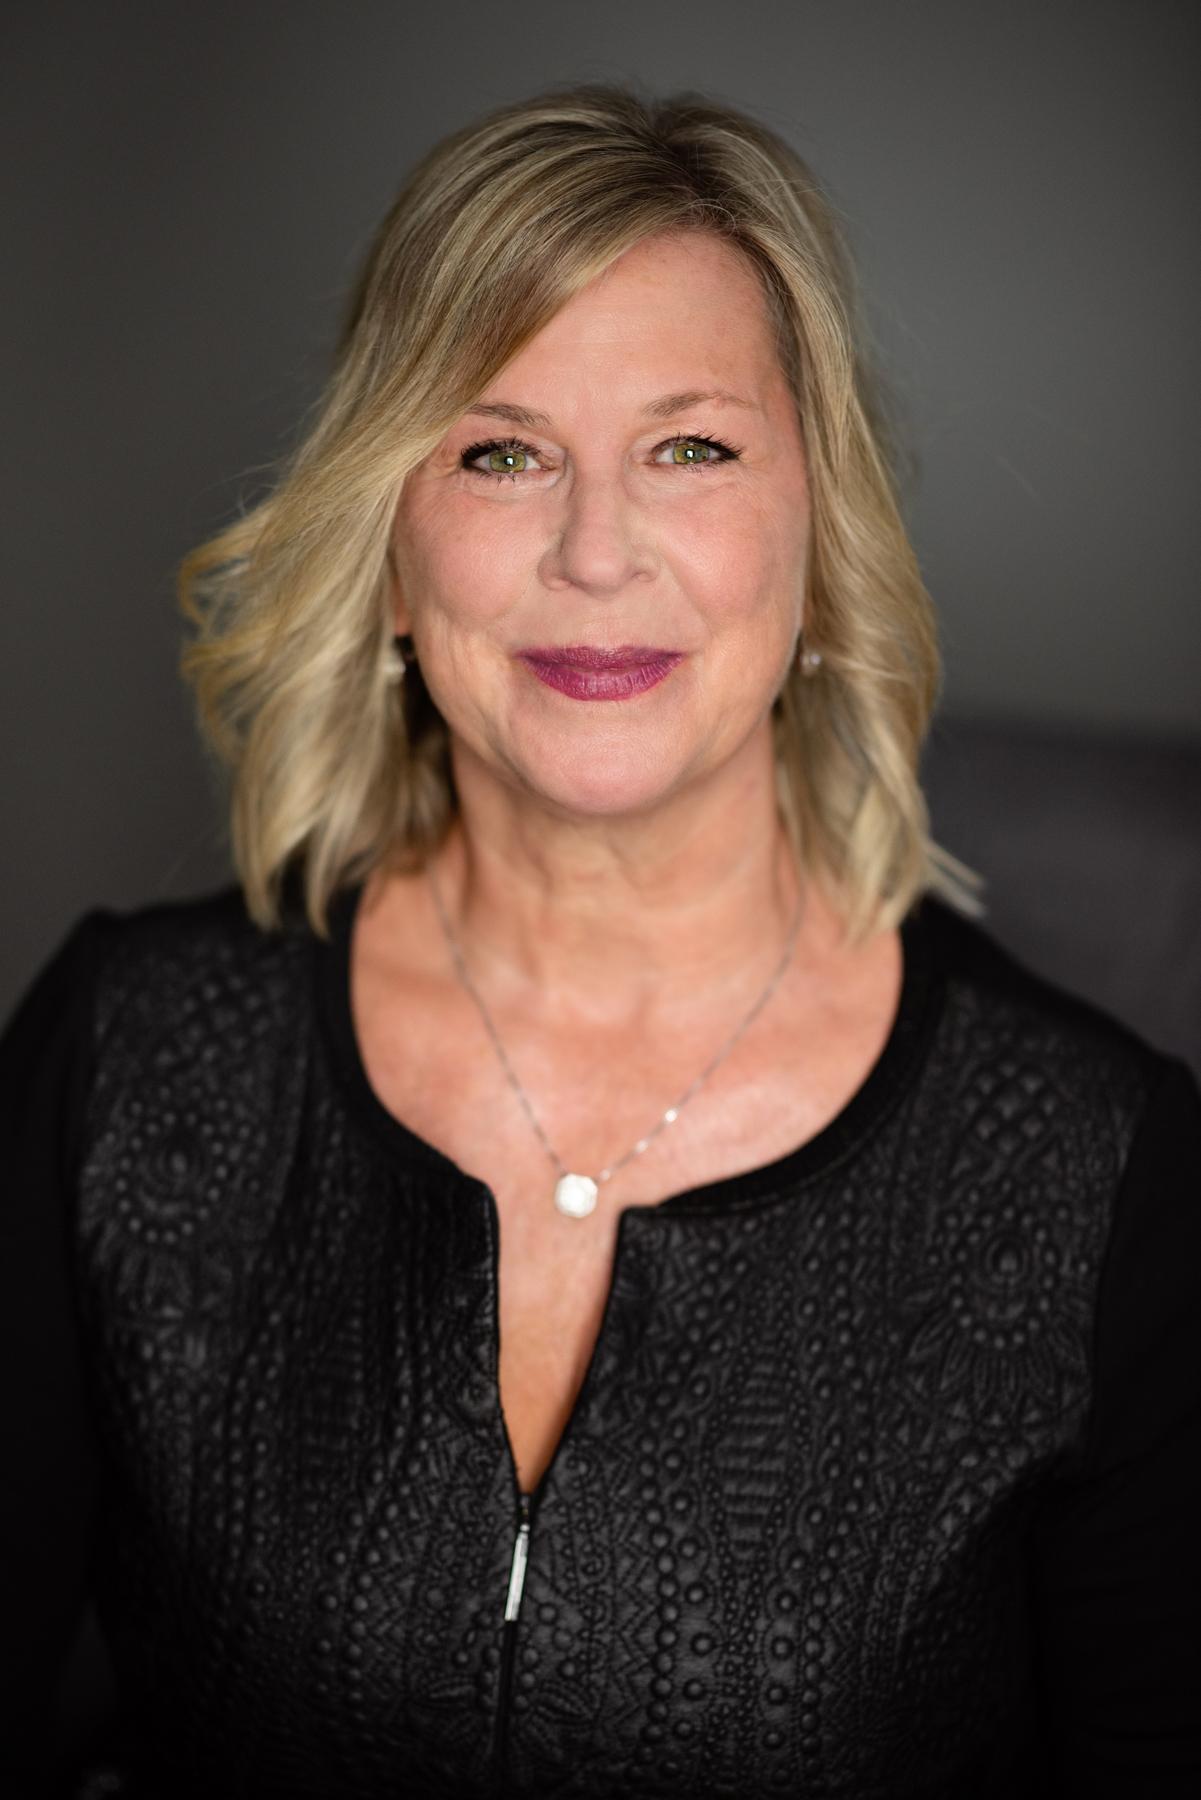 Jill Torigian